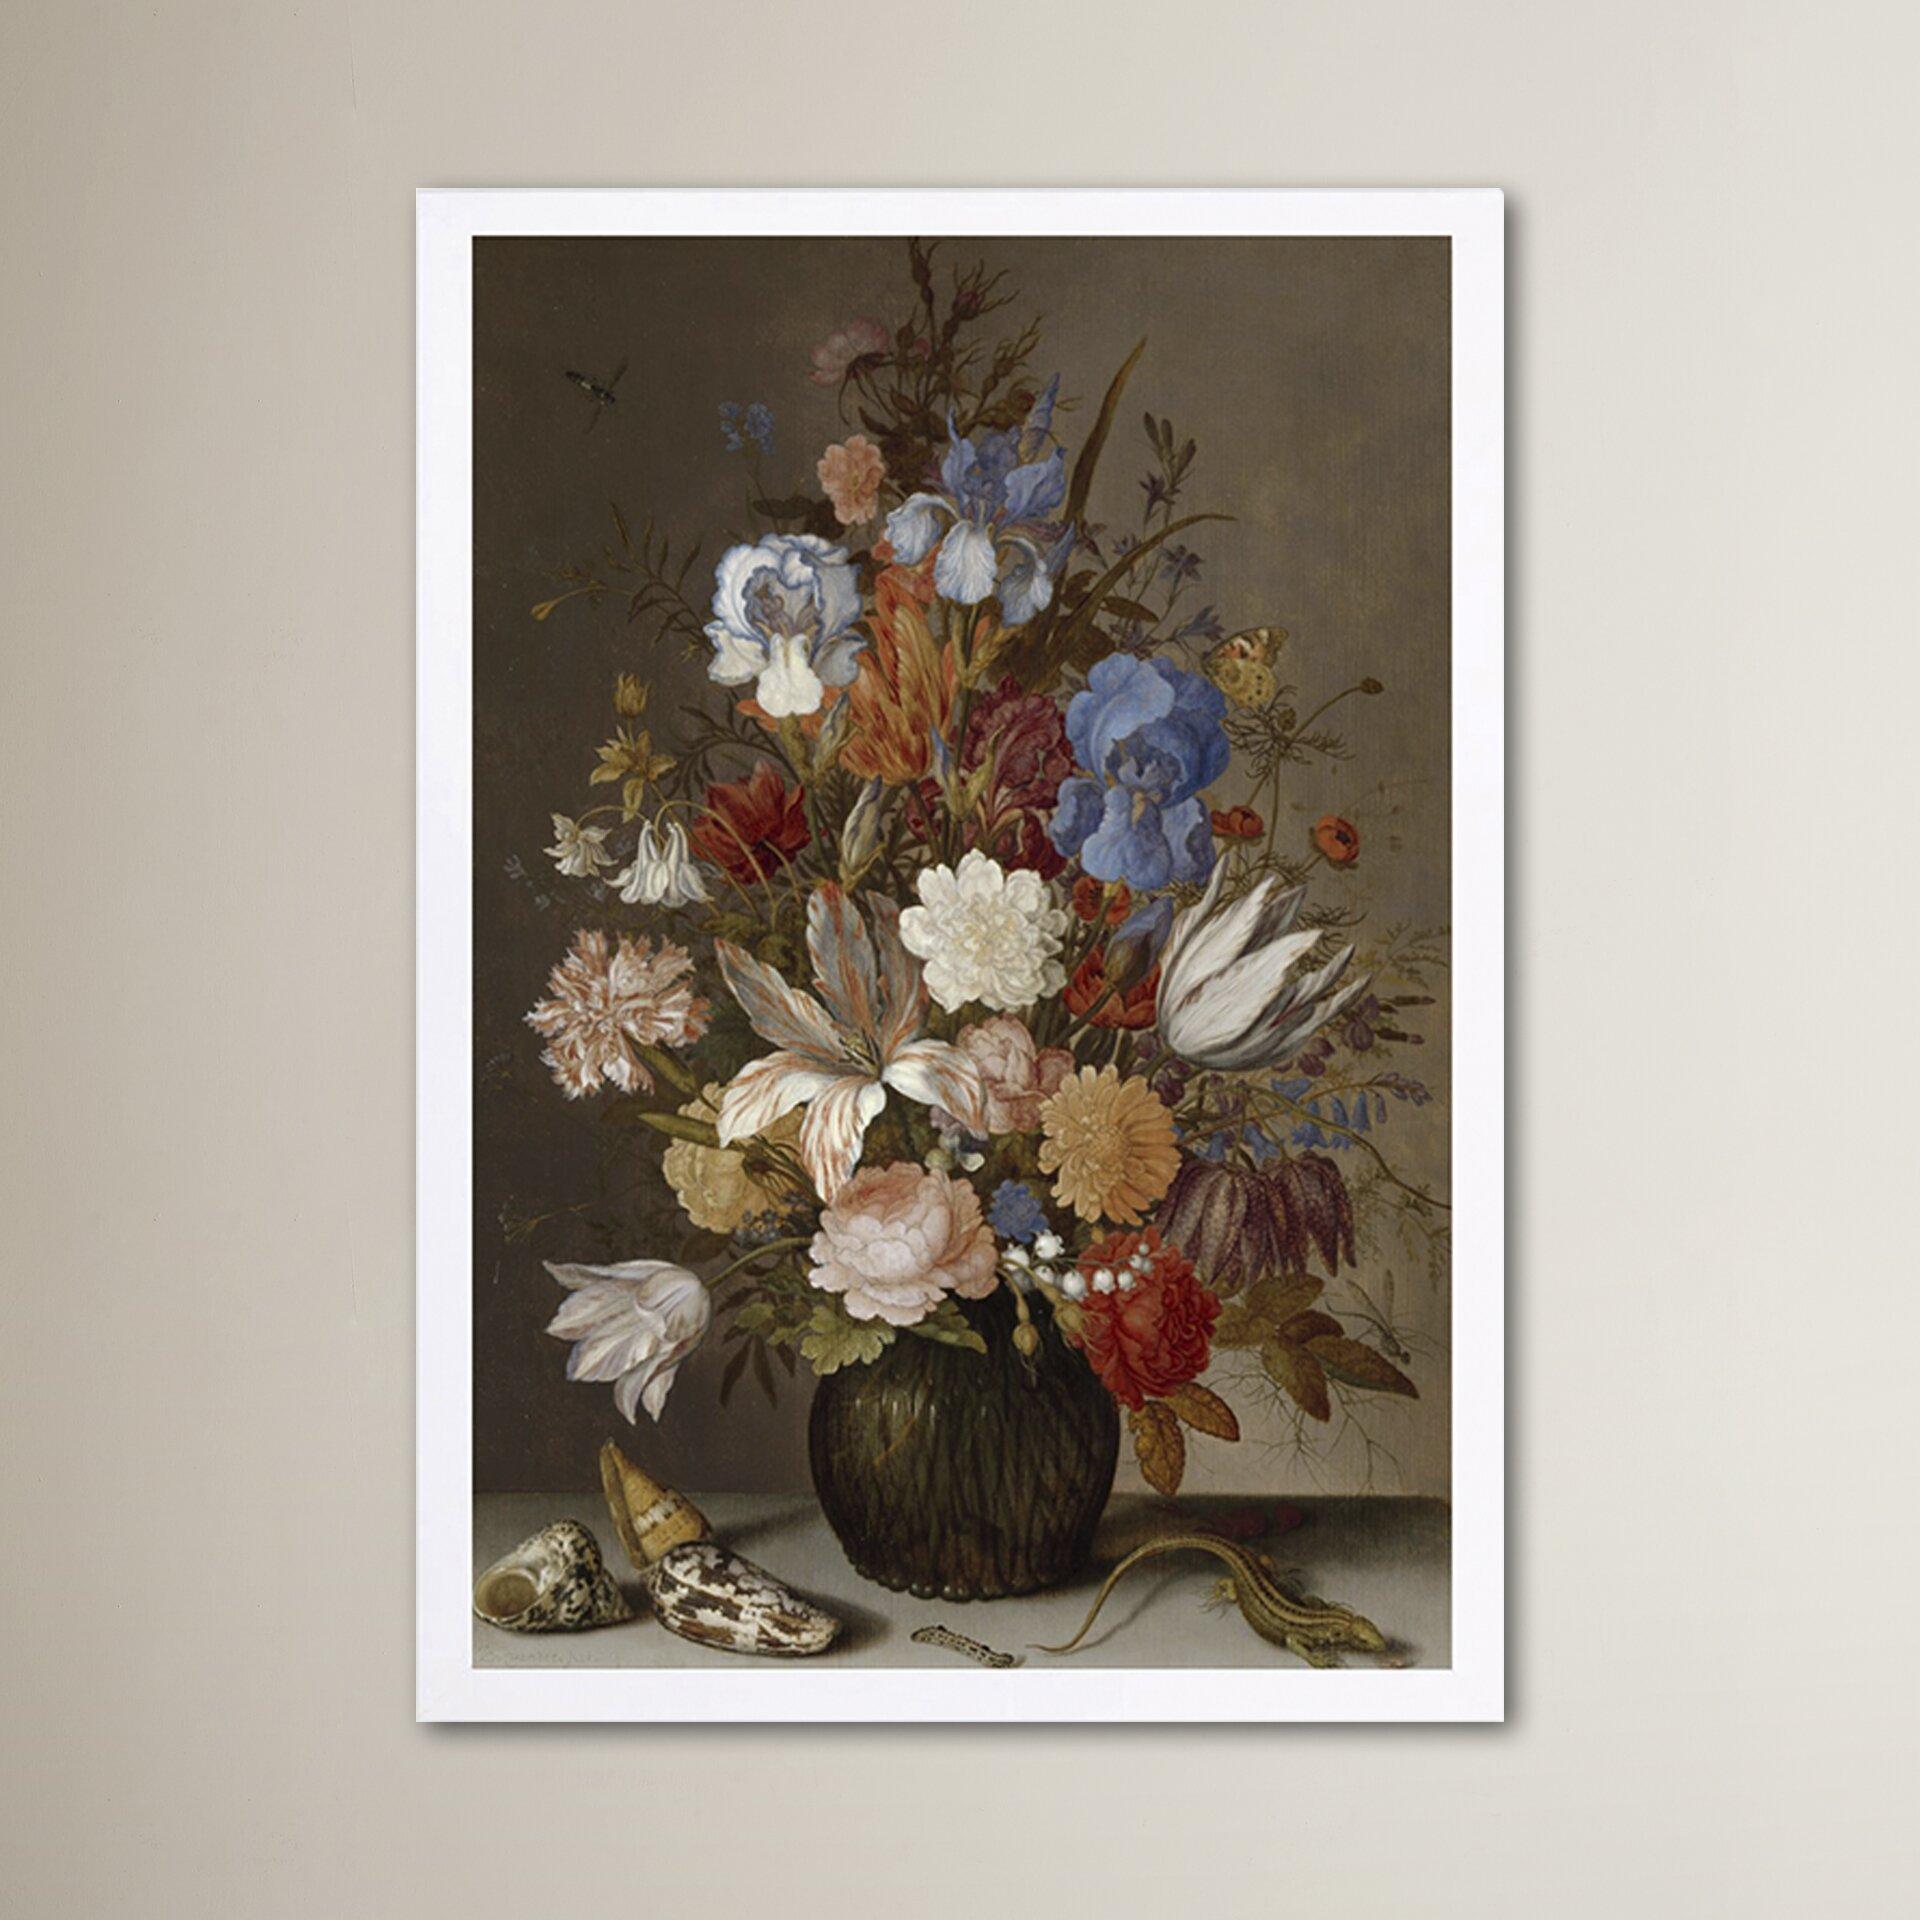 39 flower arrangement v 39 framed painting print for Wall decor arrangements